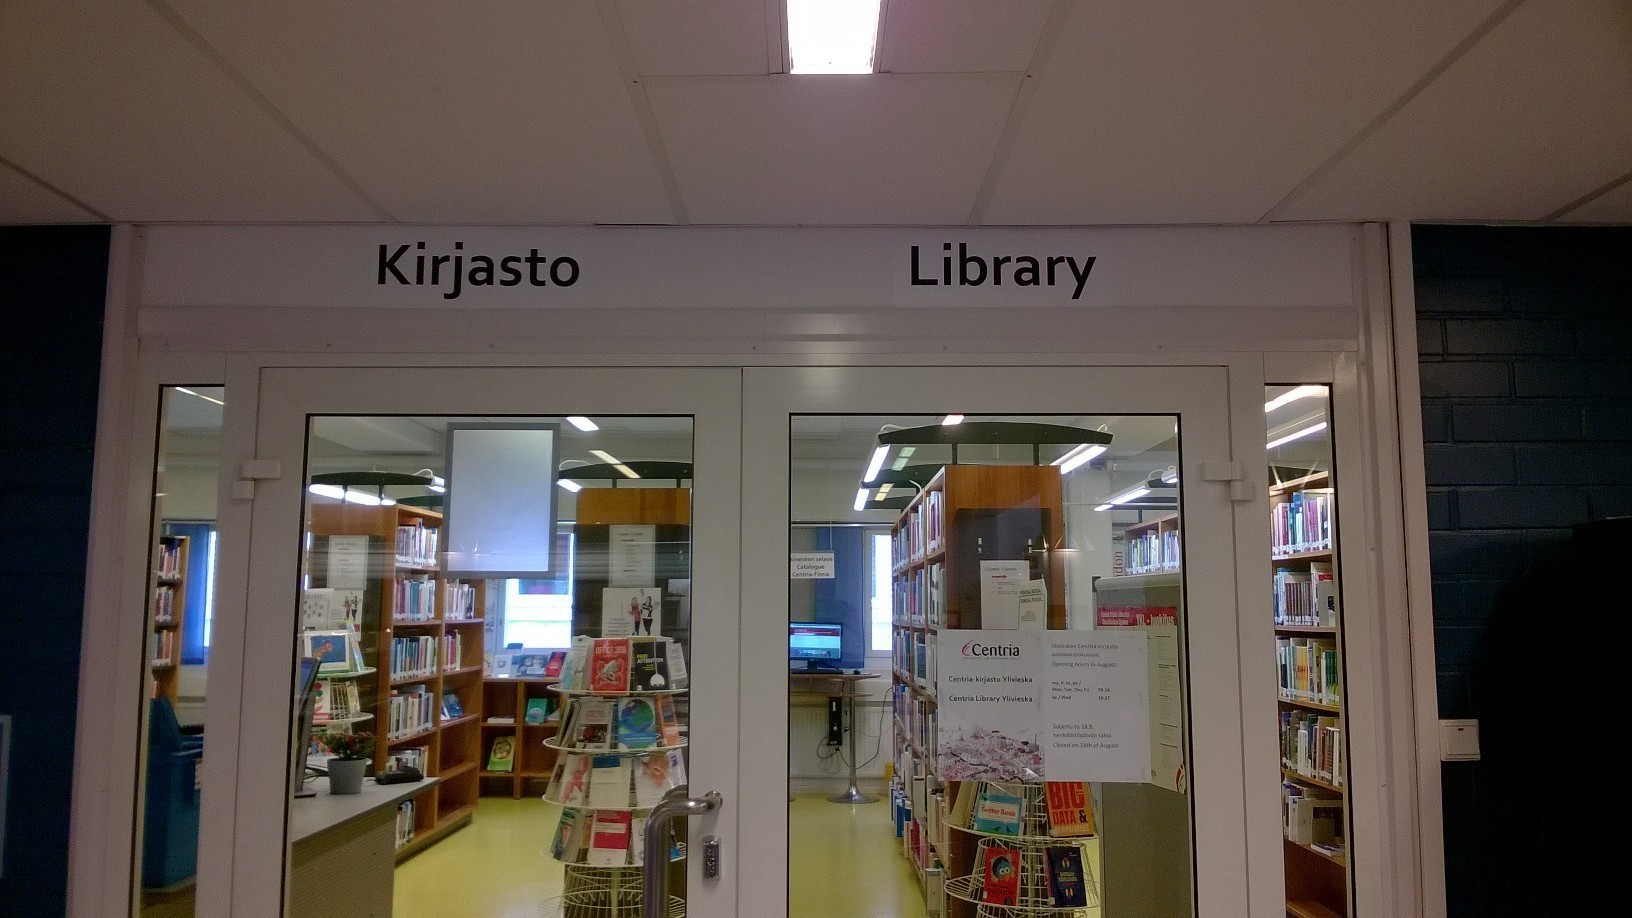 Centria-kirjasto Ylivieska